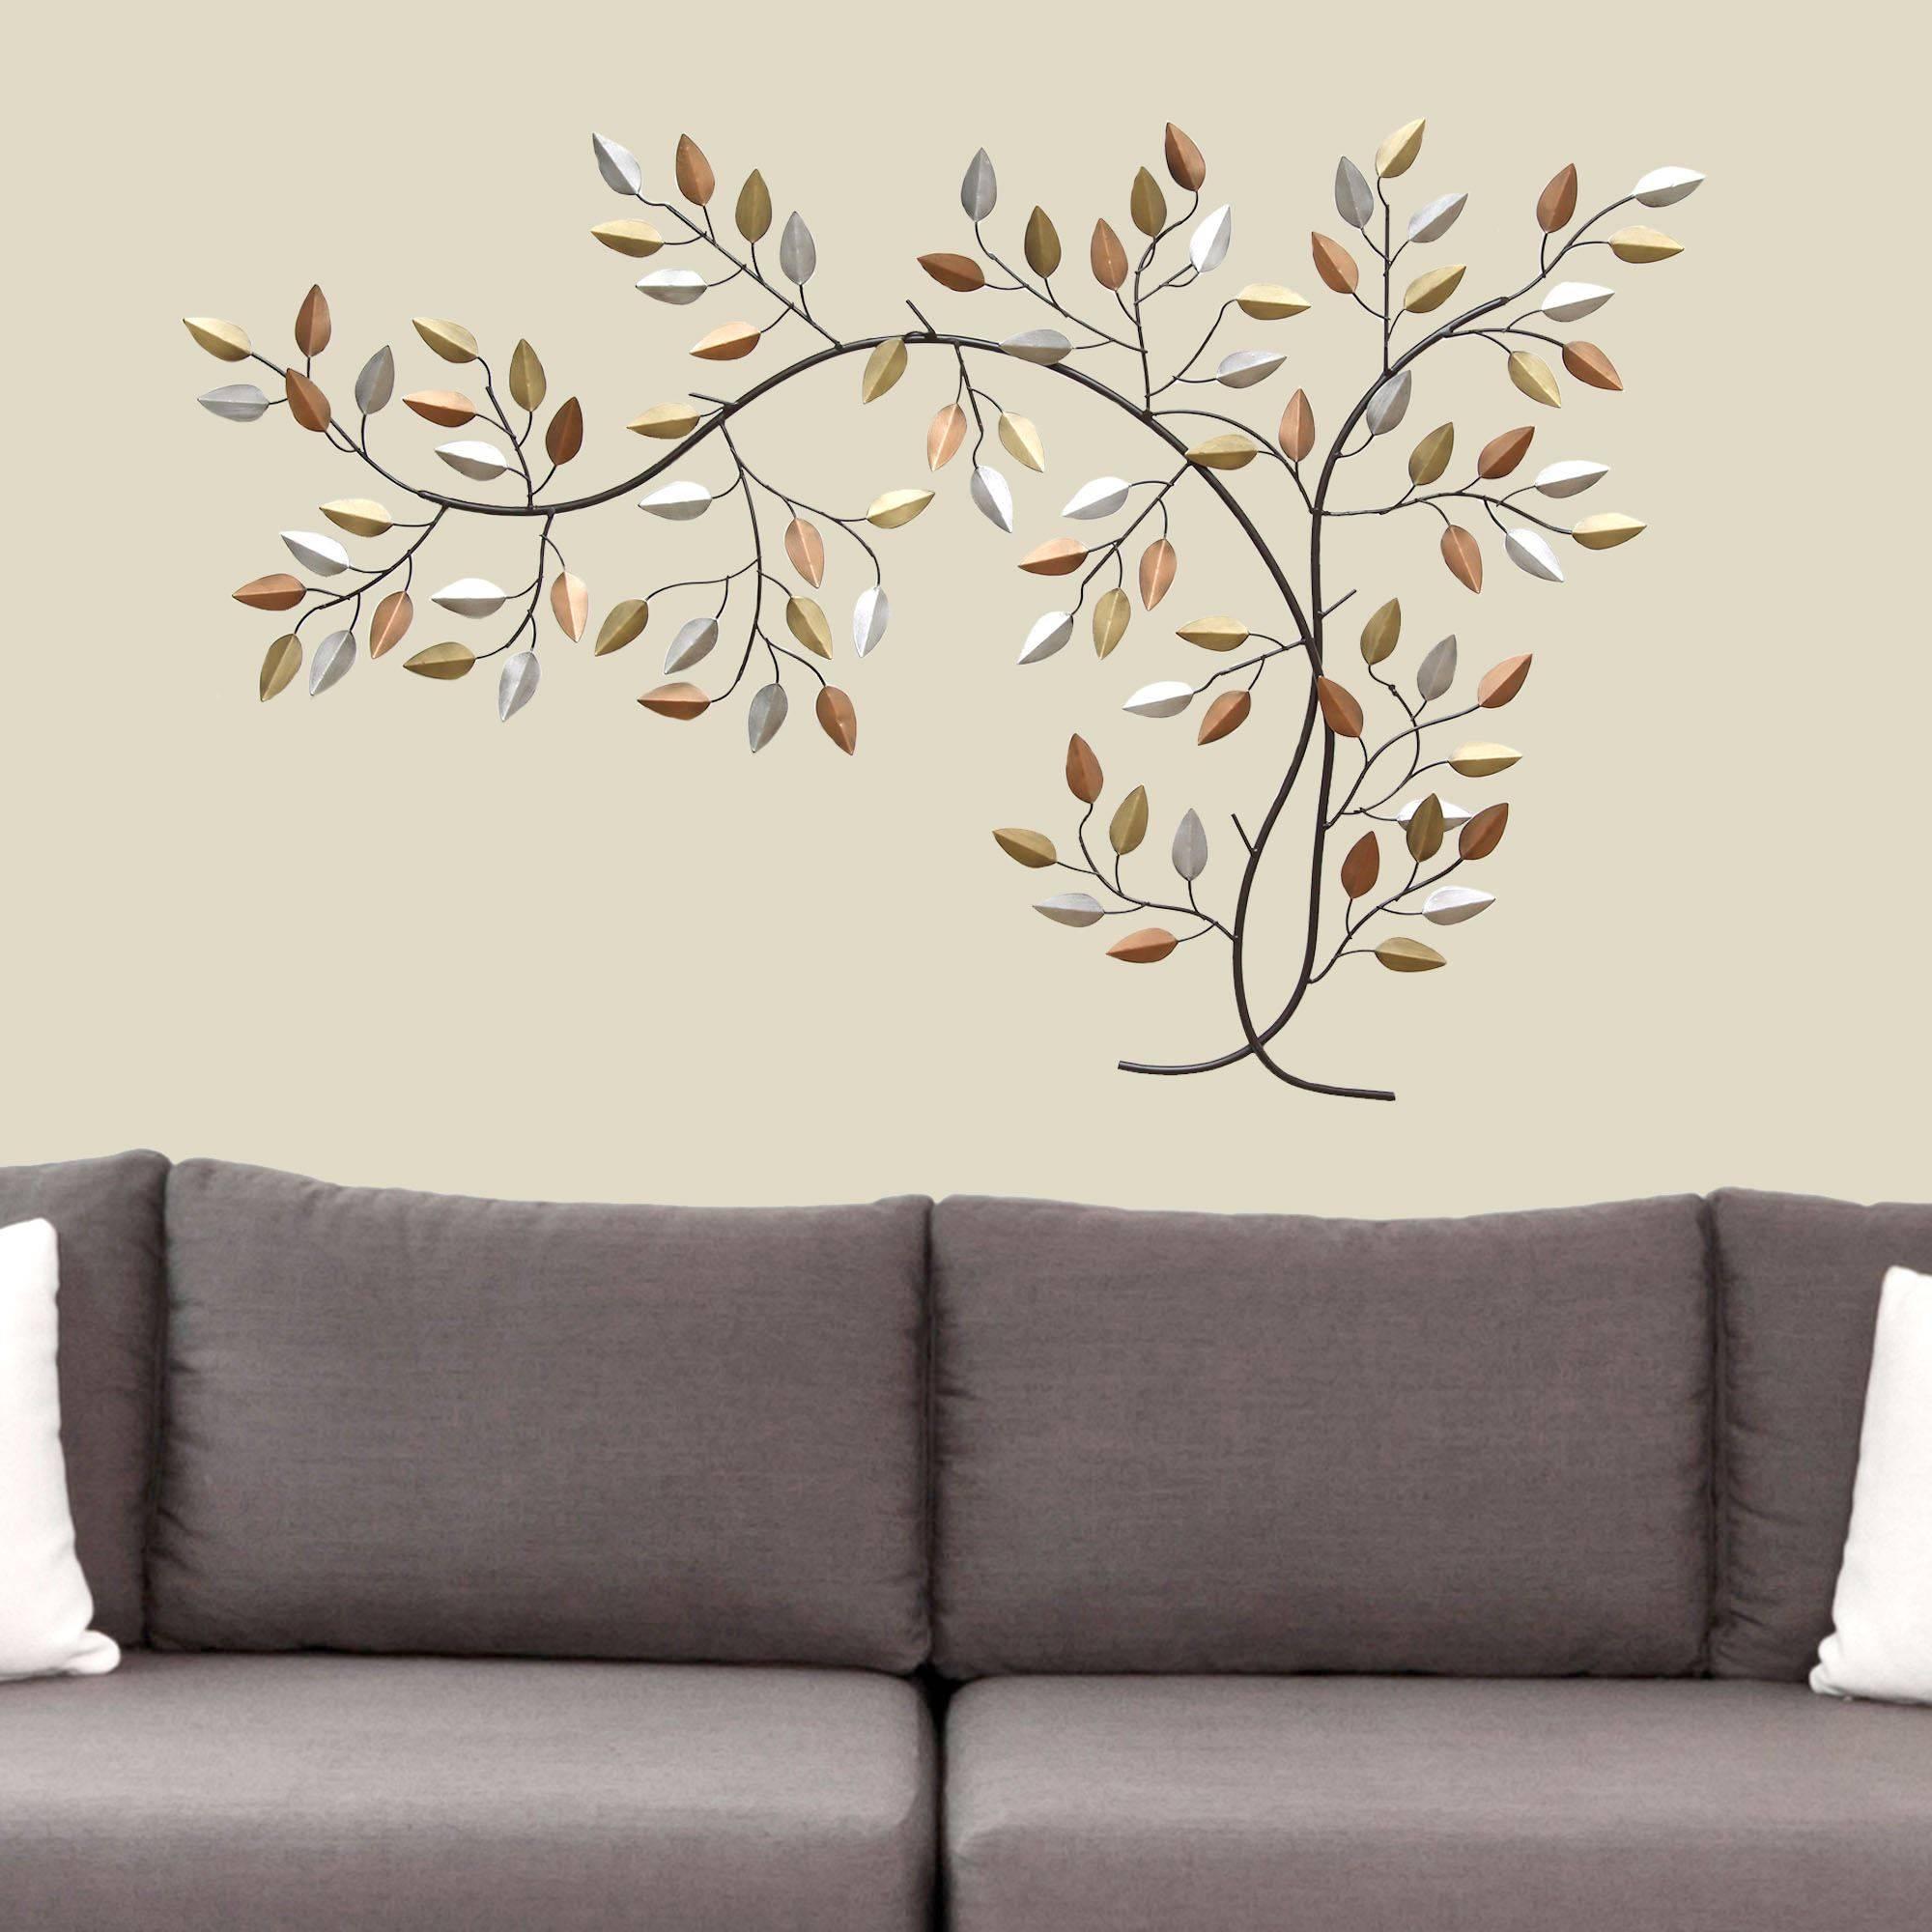 Leaf Branch Metal Wall Art In 2018 Tree Branch Wall Art (View 3 of 20)